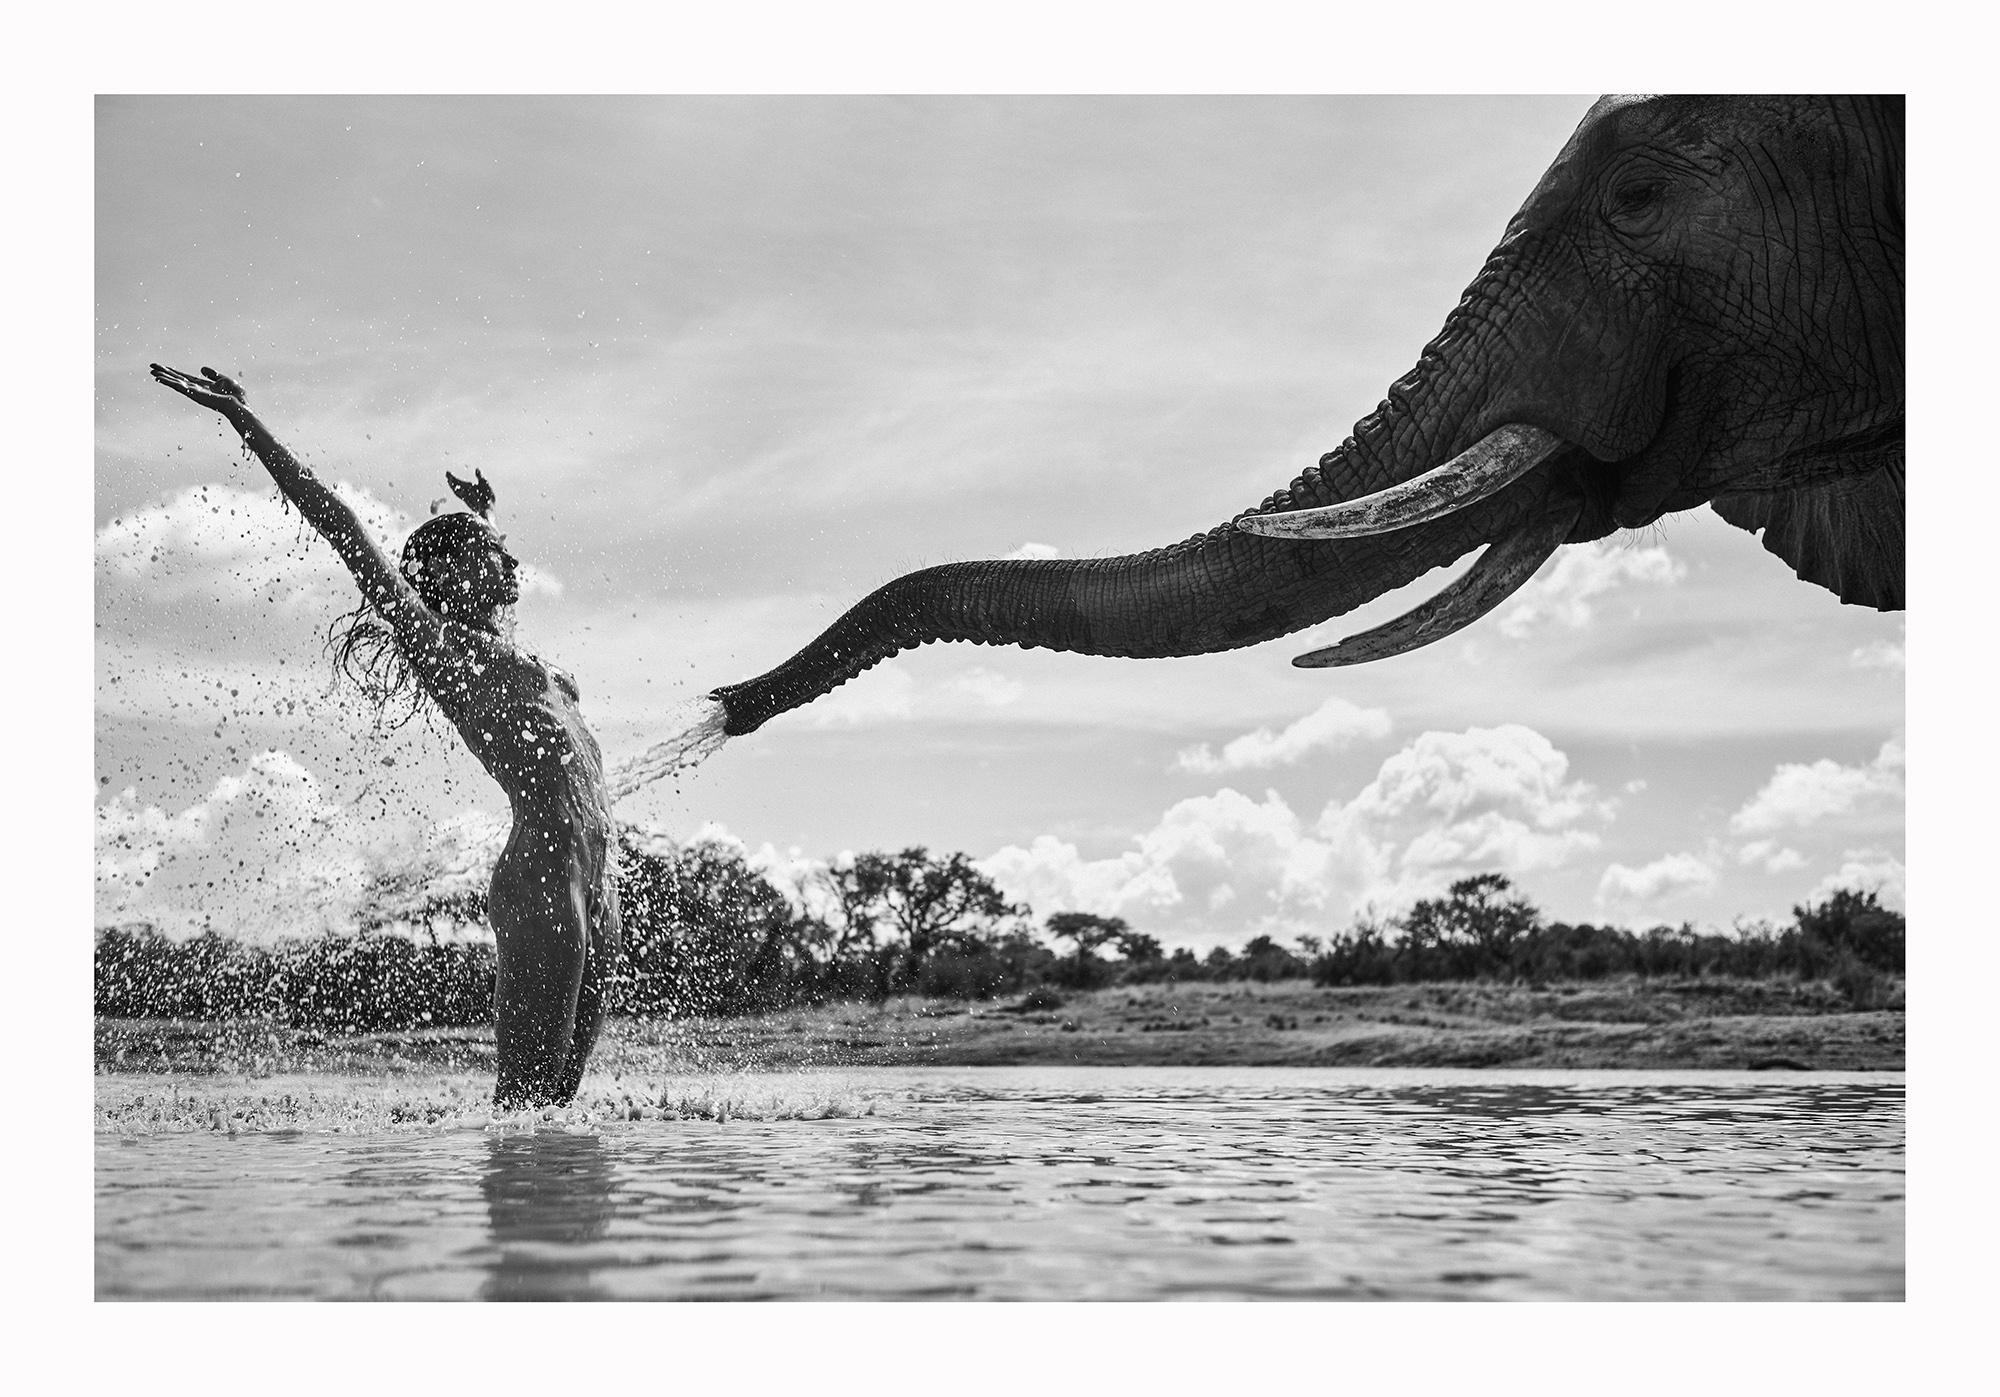 12 Natural Wonders in Afrika von Paul Giggle 2